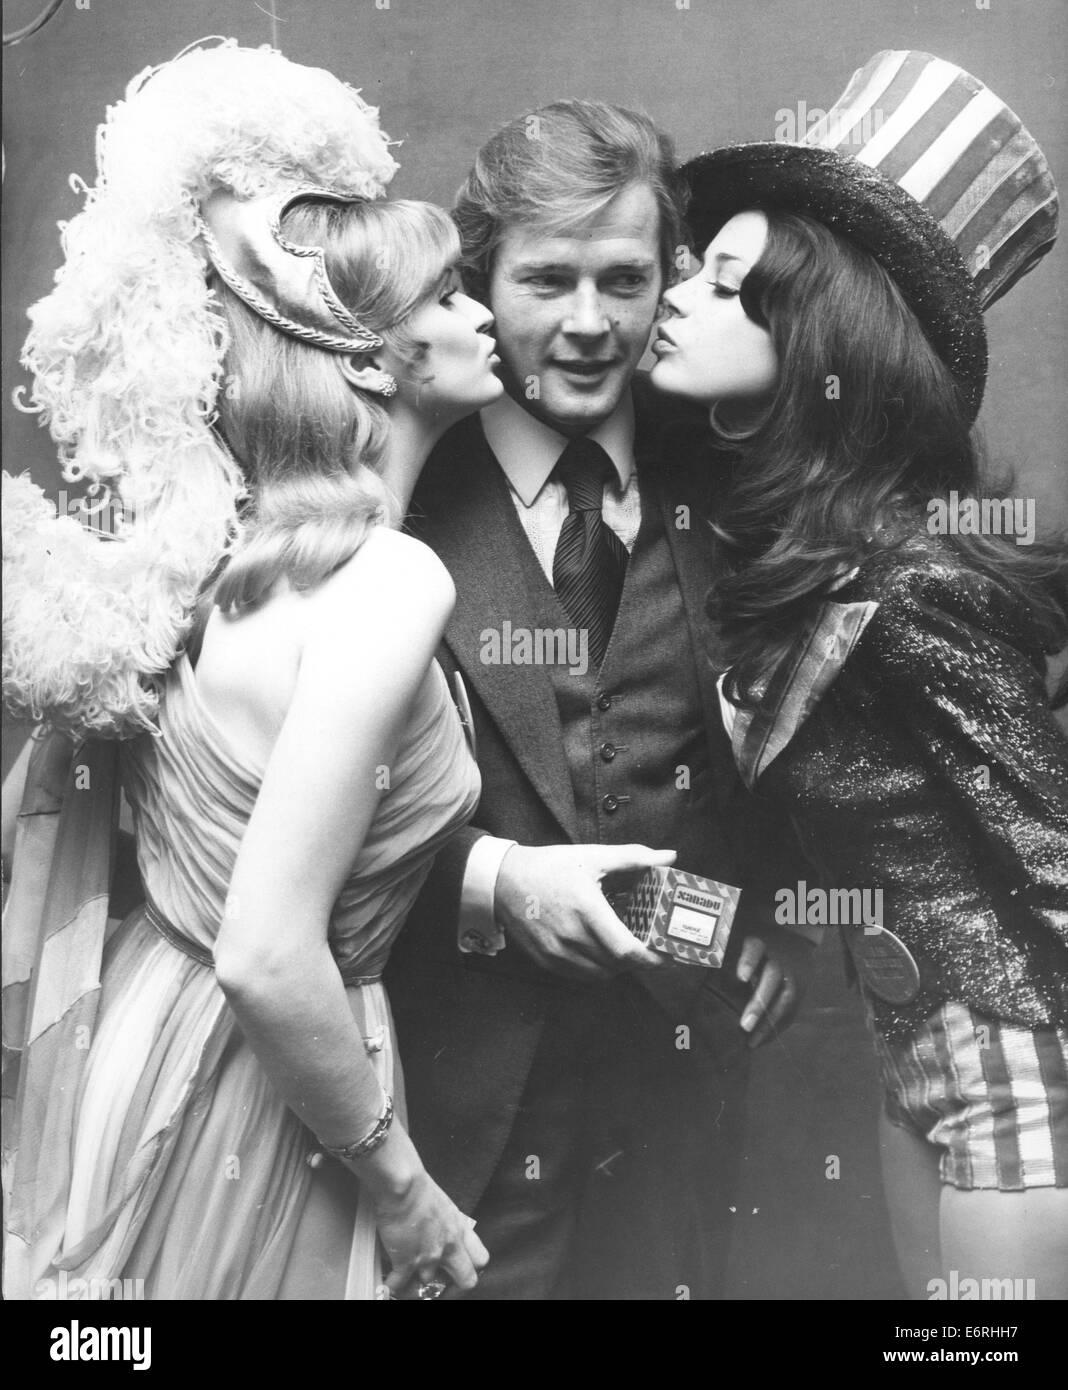 4 November 1971 London England Vereinigtes Königreich Sir